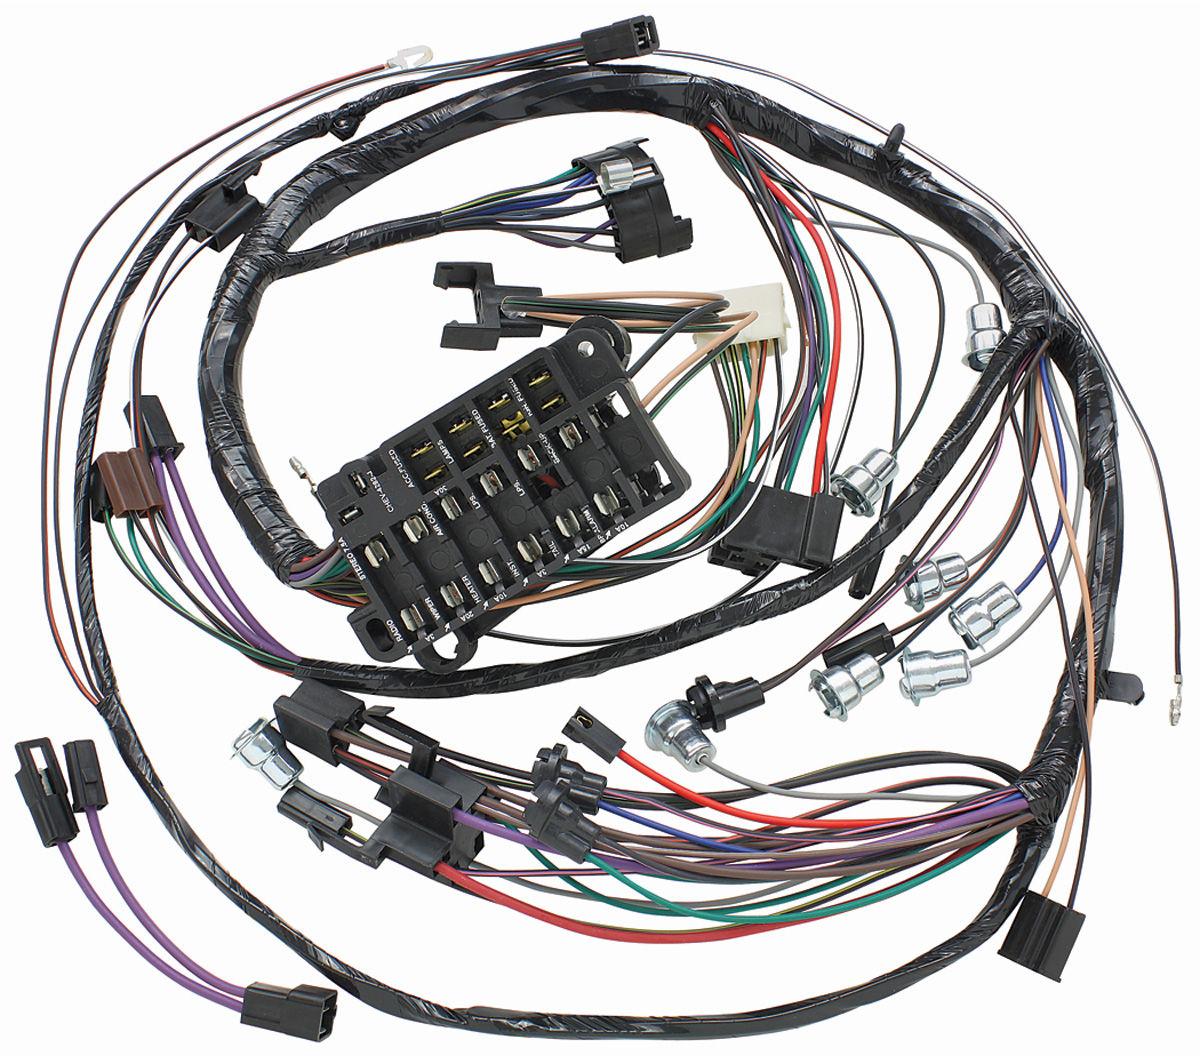 small resolution of 67 chevelle dash fuse box wiring library dodge charger fuse box 67 chevelle dash fuse box